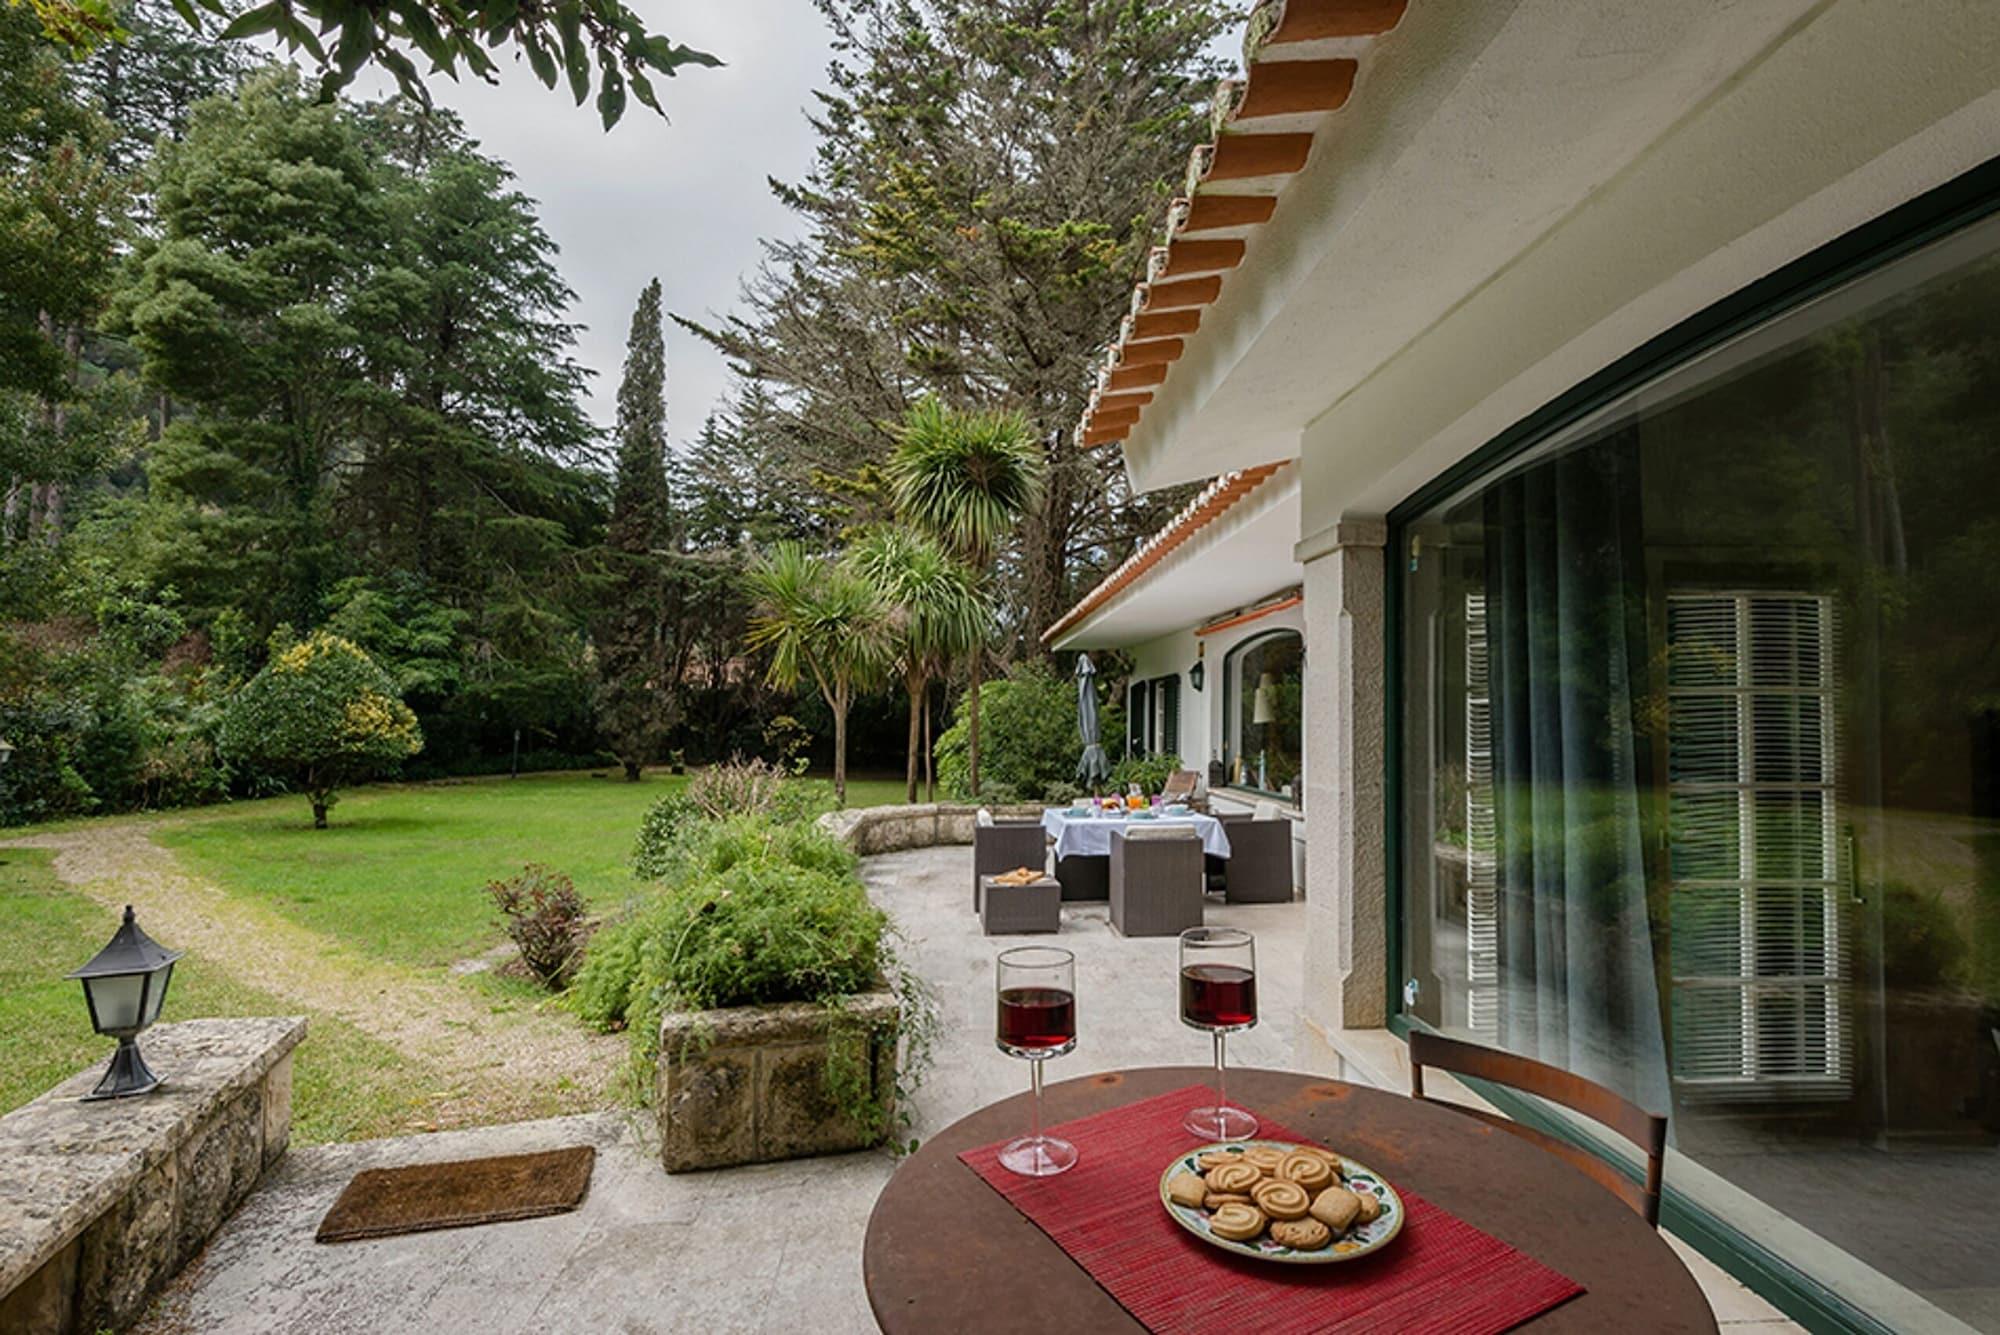 ALTIDO Villa Valeverde, Sintra